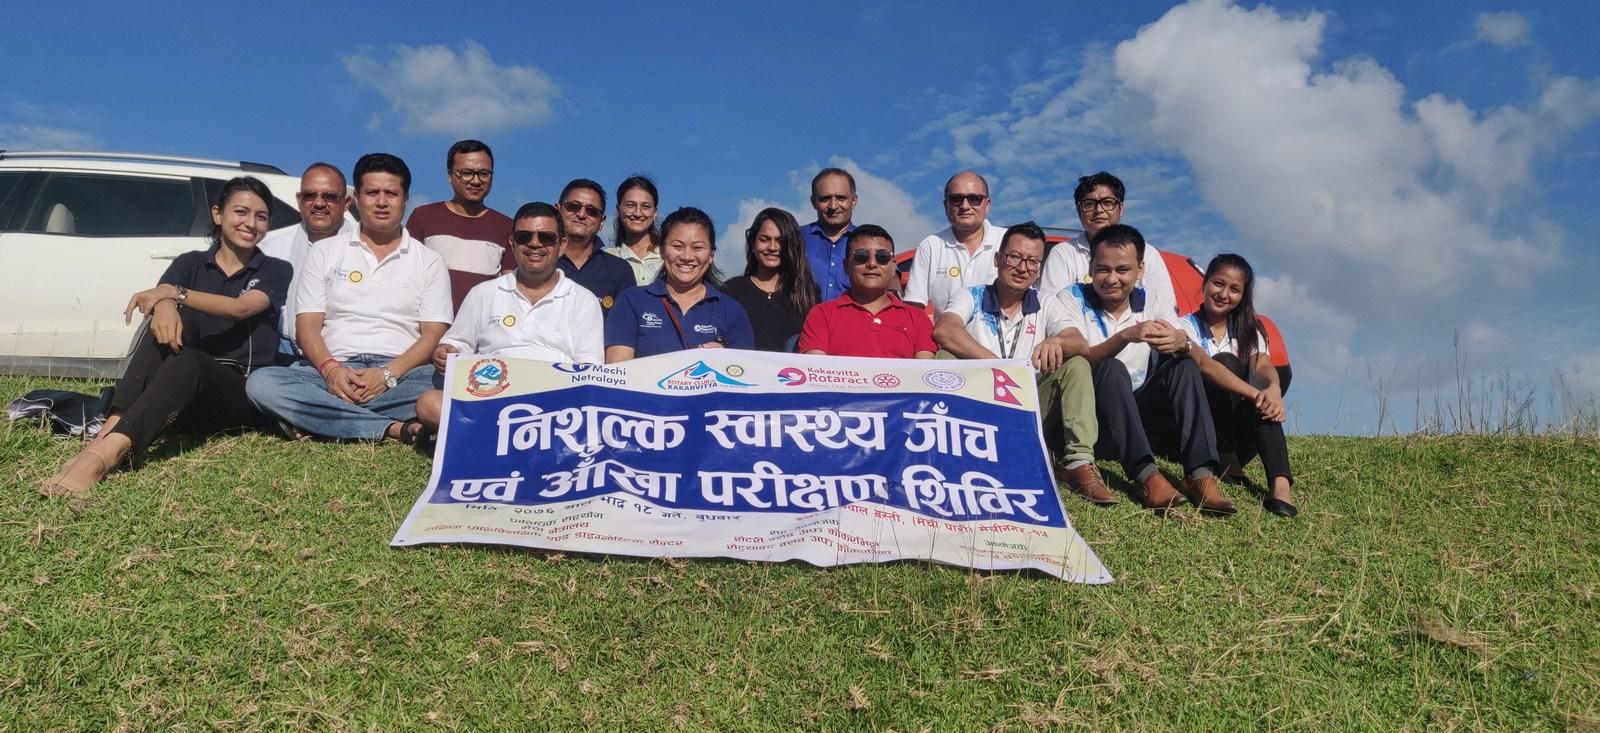 Free-Health-Camp-Eye-Screening-at-Gwala-Basti-Mechinagar-15-Jhapa-Nepal-Rotary-Club-of-Kakarvitta-47